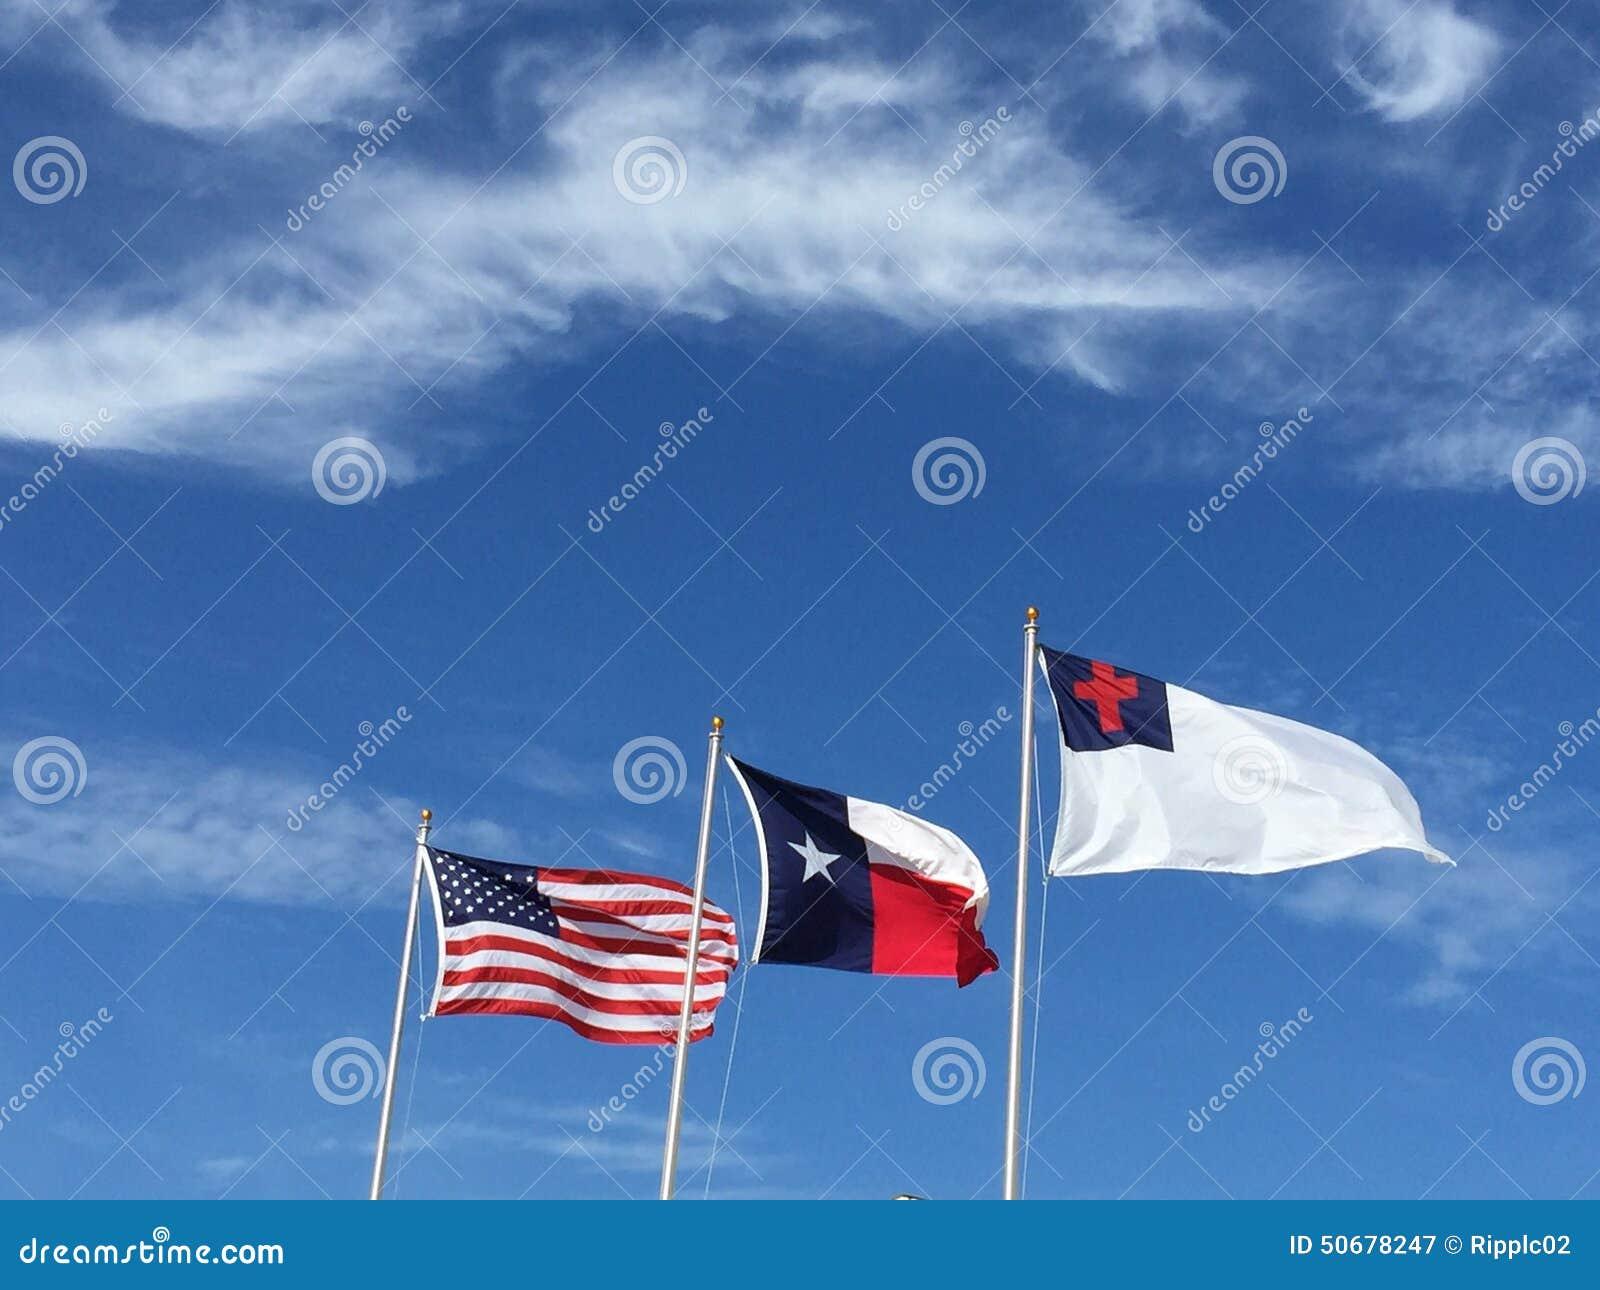 Download 美国德克萨斯人和基督徒 库存图片. 图片 包括有 基督徒, 交叉, 天空, 标志, 学校, 飞行, 大使 - 50678247